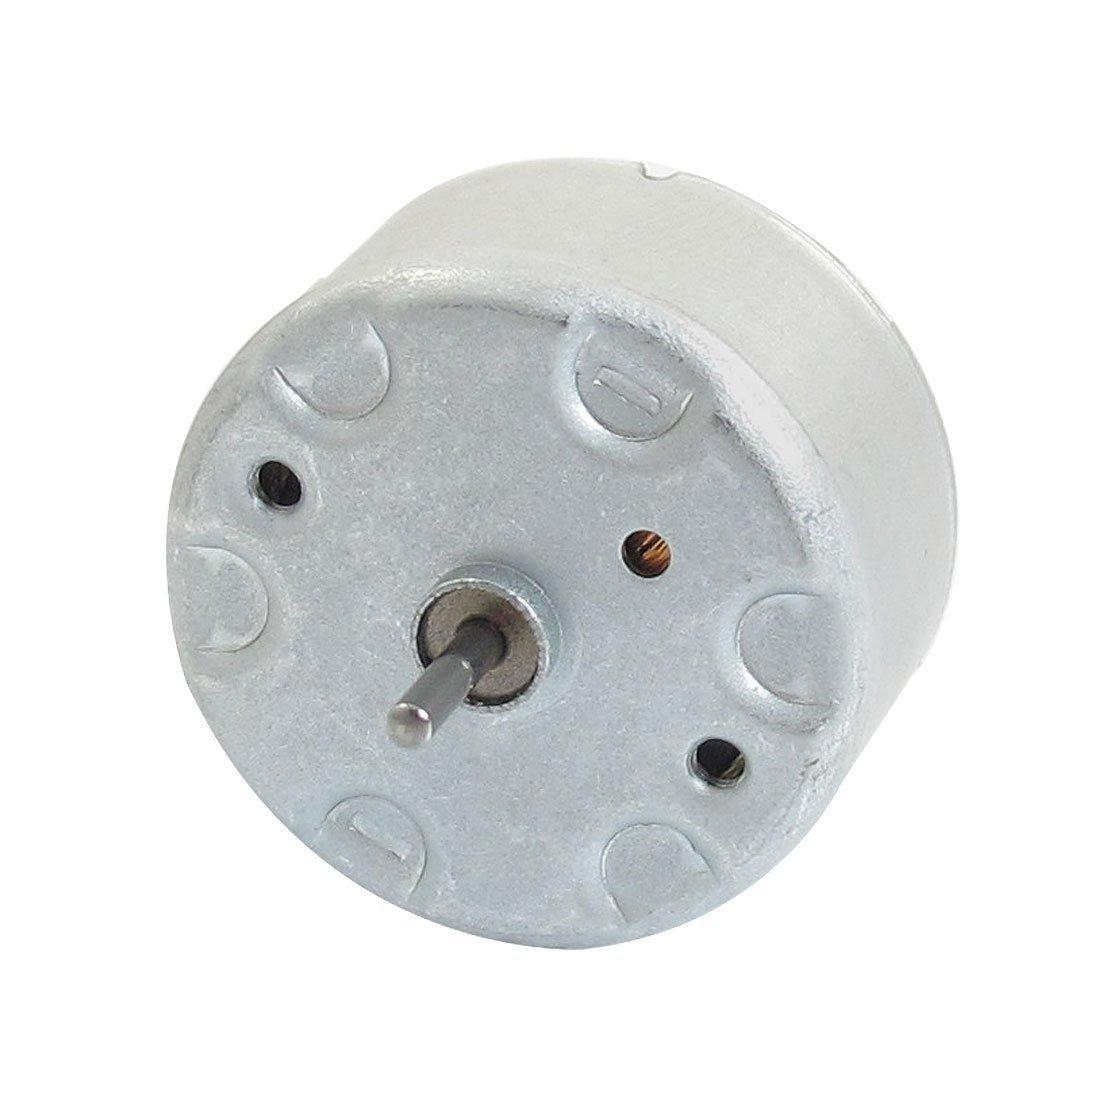 0,02 A 0023 A 6 V Mini eléctrica de alto par Motor DC sourcingmap CECOMINOD006909